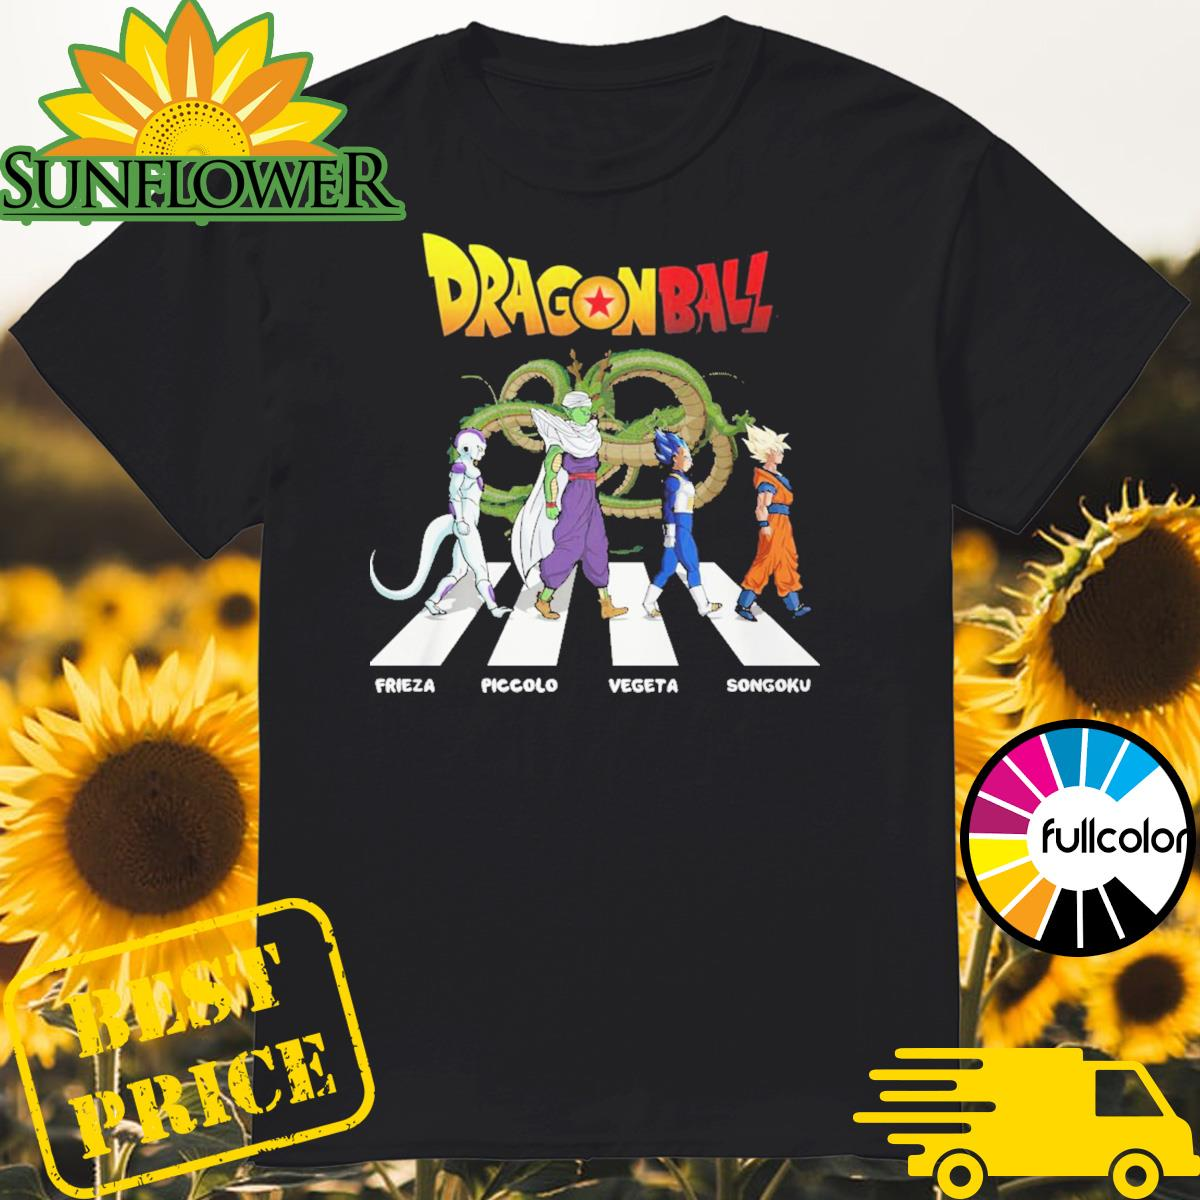 Dragon Ball Frieza Piccolo Vegeta Songoku walking on the street shirt